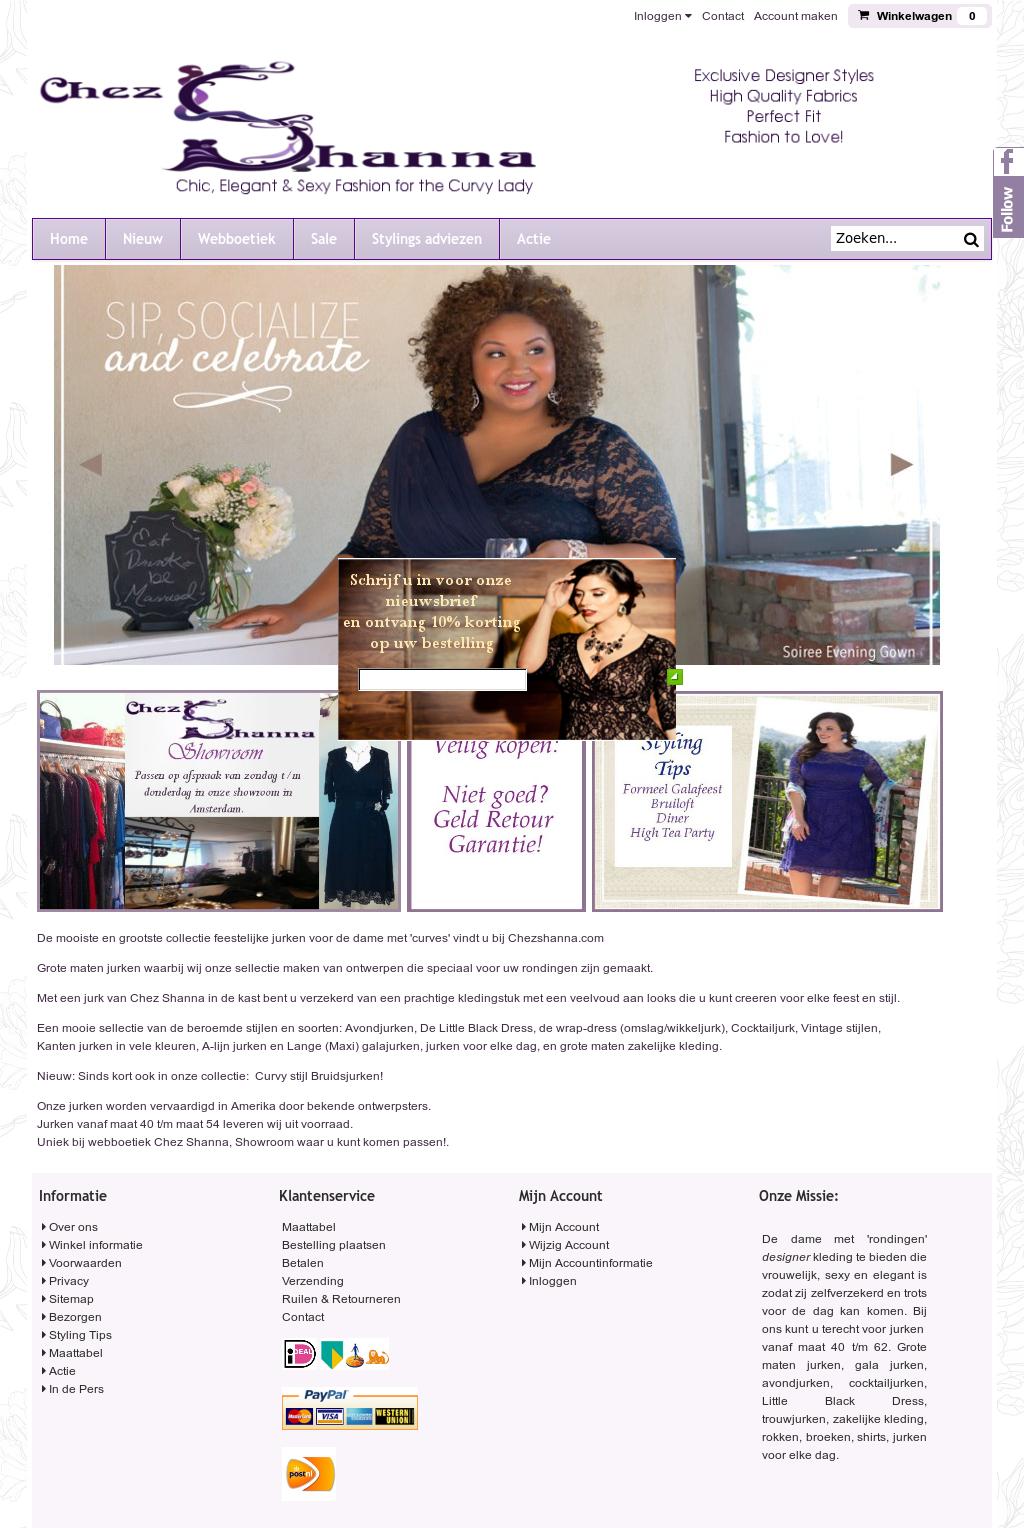 Design Avondjurken.Chez Shanna Competitors Revenue And Employees Owler Company Profile